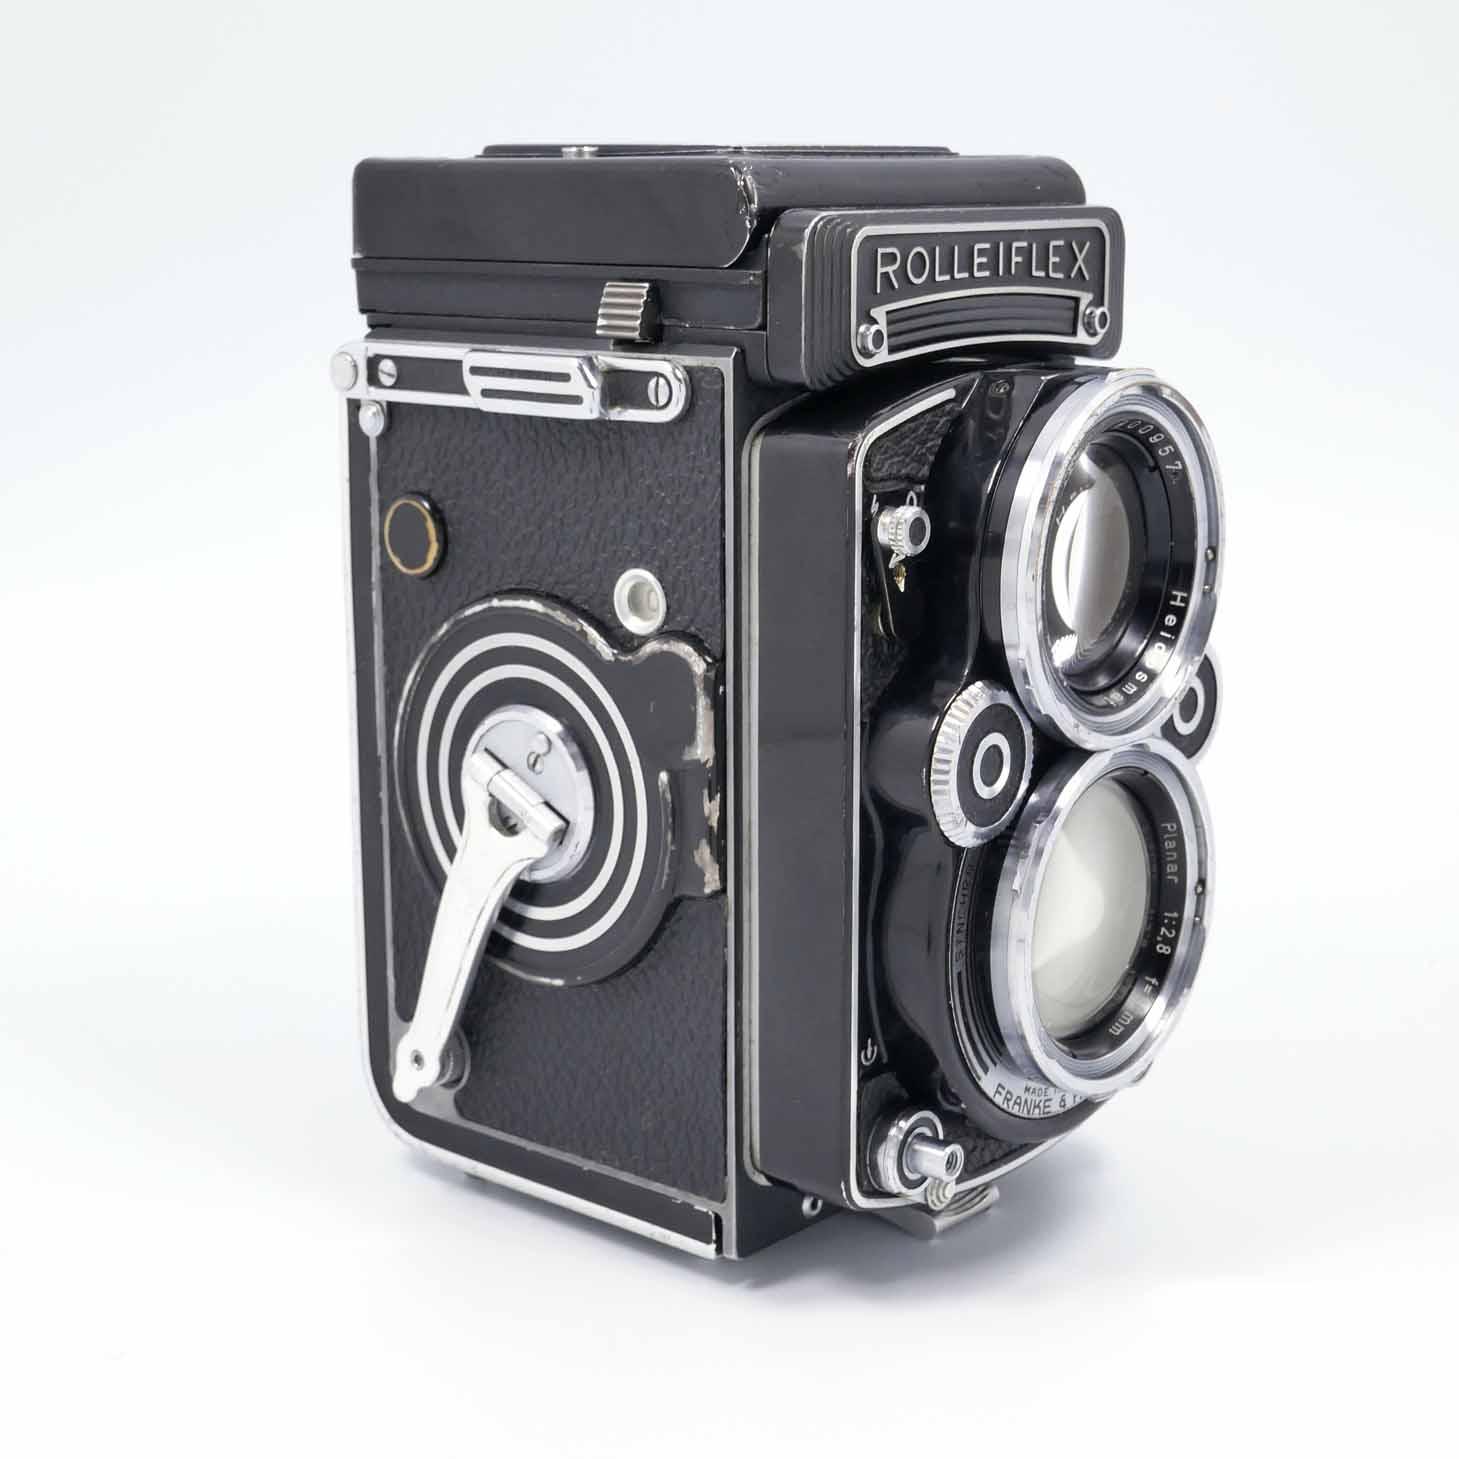 clean-cameras-Rolleiflex-2.8-F09